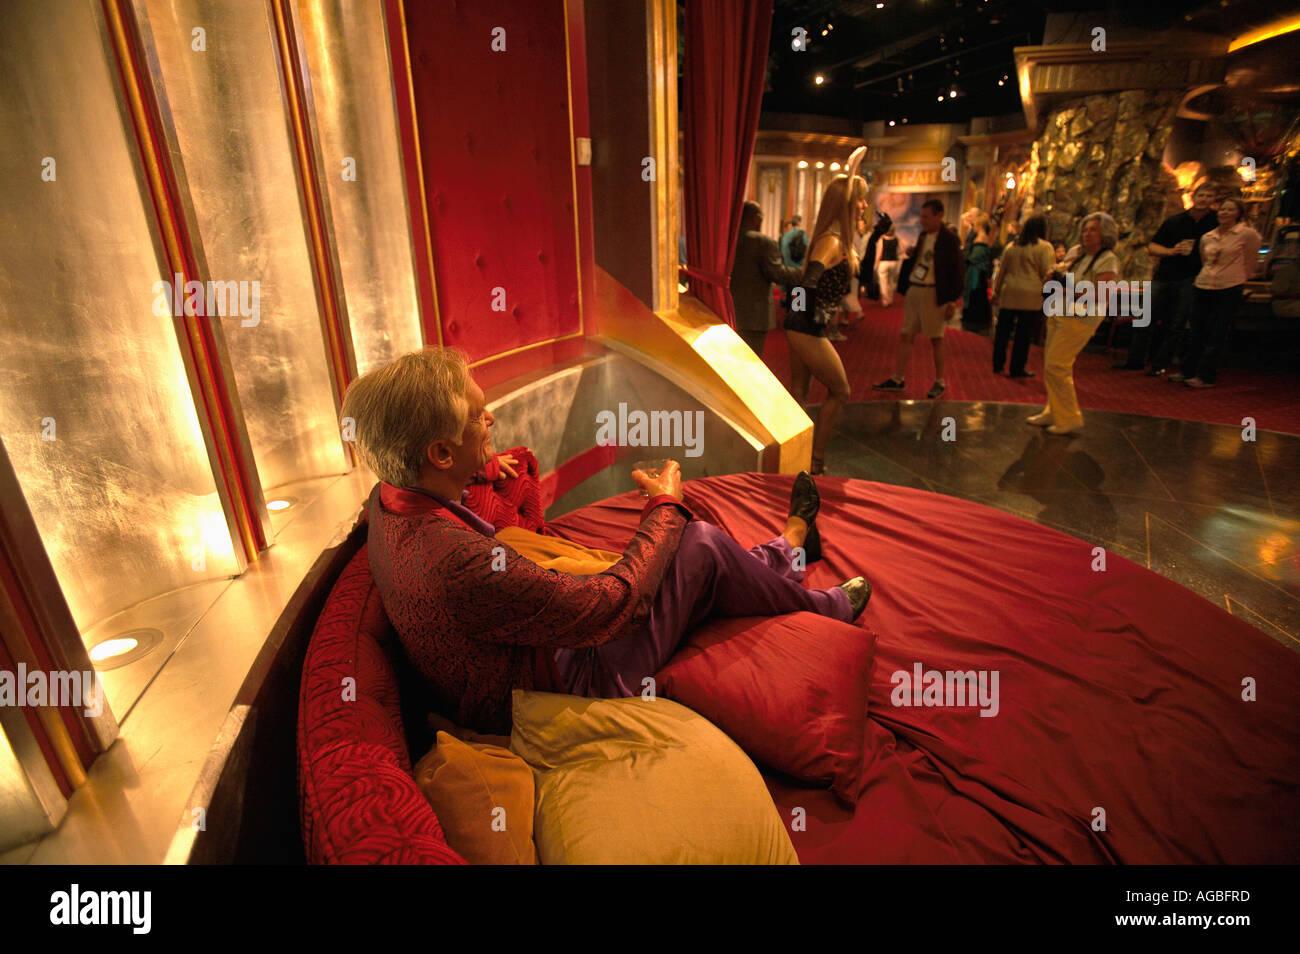 wax hugh hefner and tourist at madame tussauds wax museum las vegas stock photo royalty free. Black Bedroom Furniture Sets. Home Design Ideas